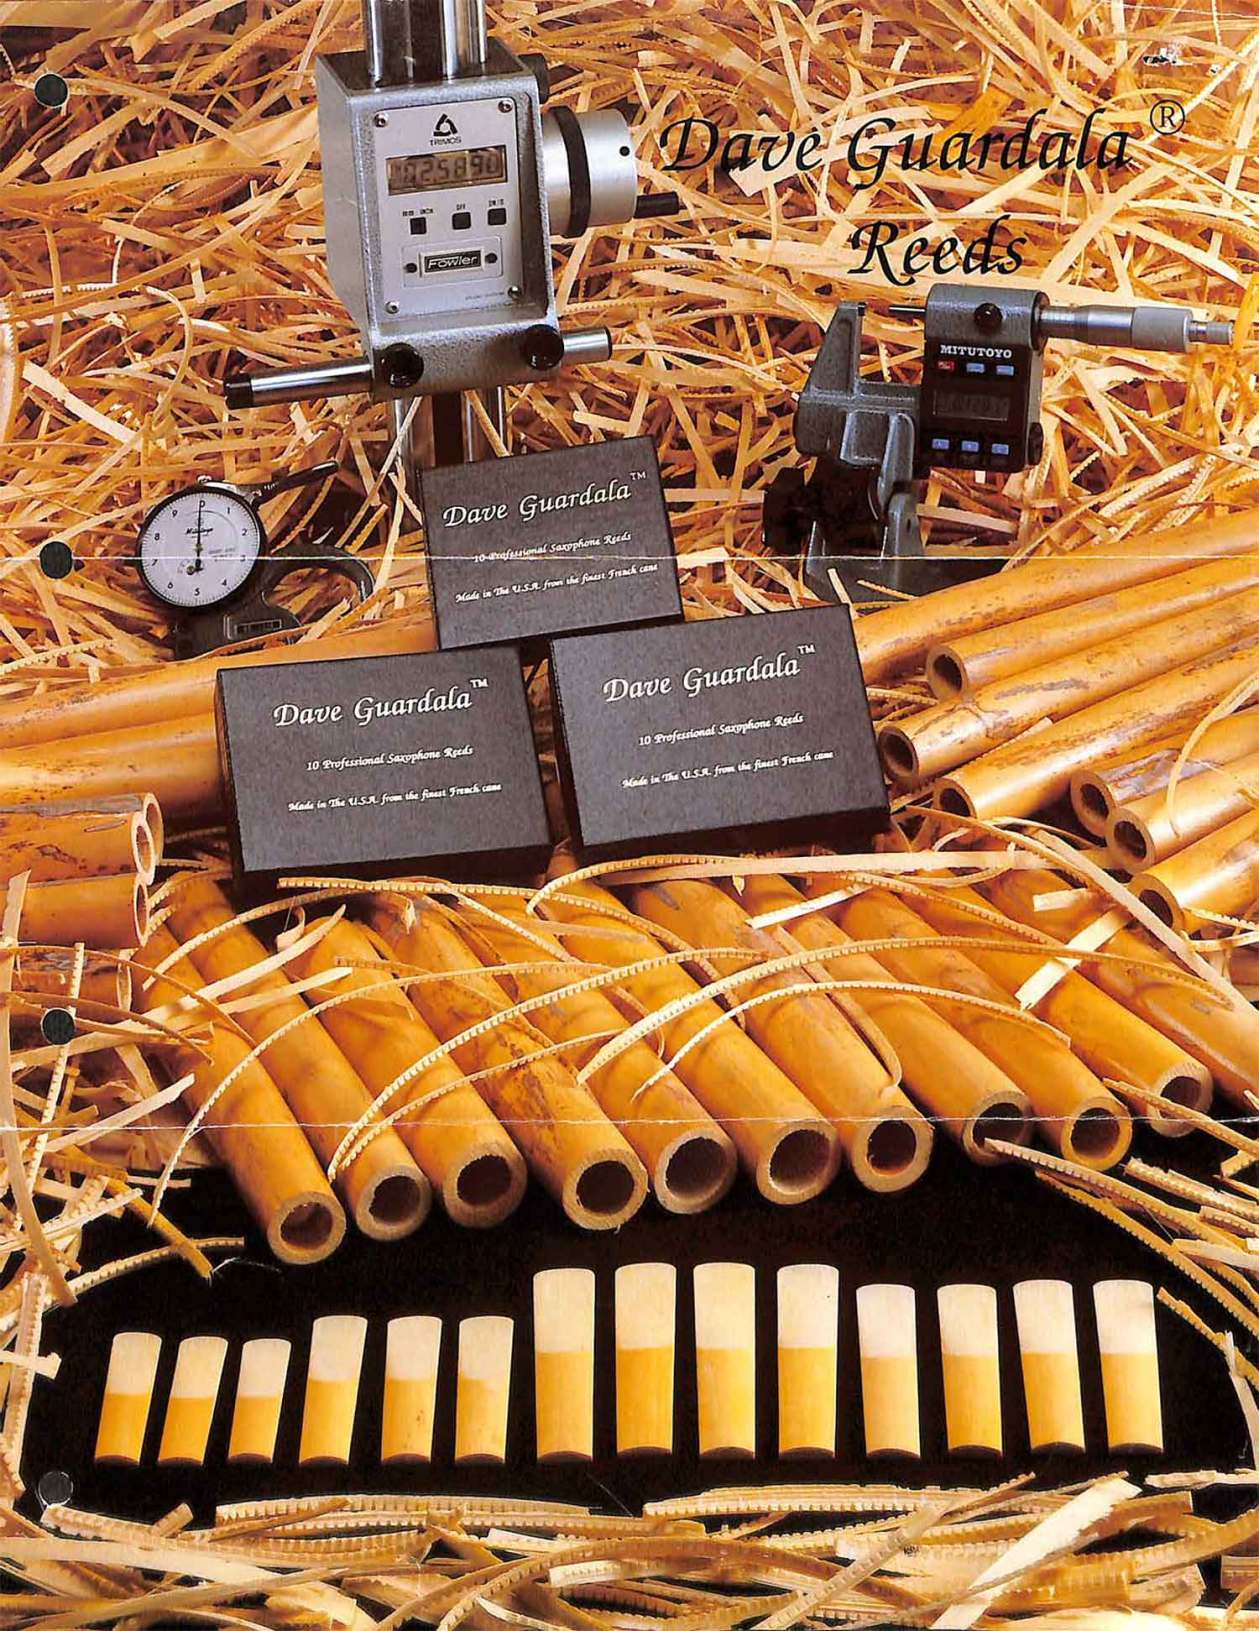 Dave Guardala, reeds, color brochure, saxophone reeds